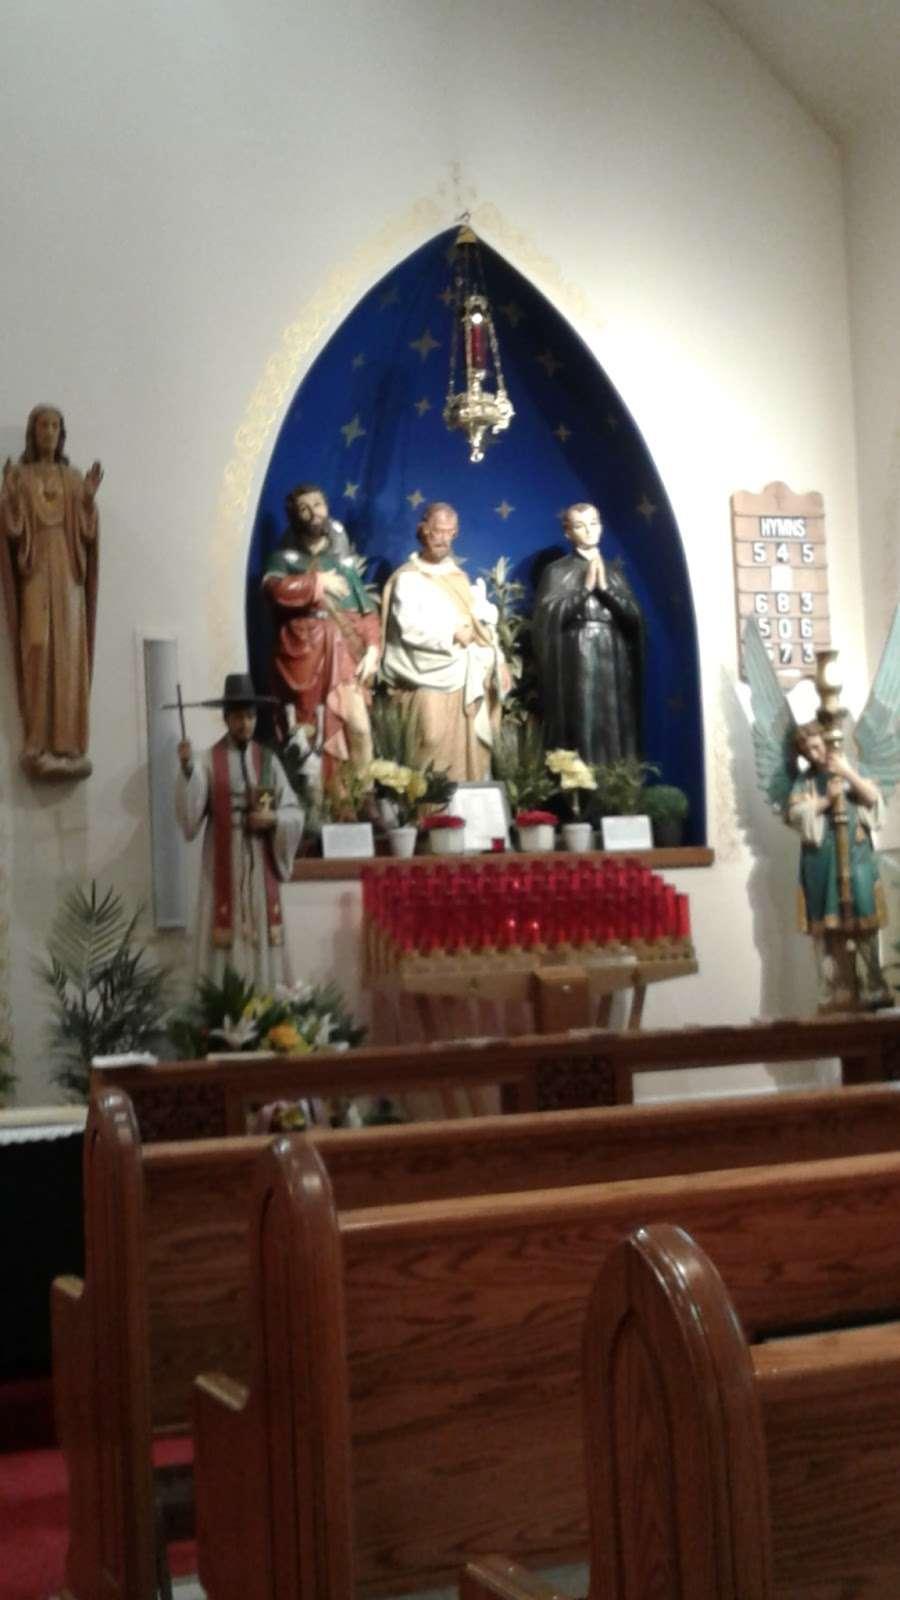 Our Lady of Victories - church  | Photo 4 of 4 | Address: 150 Harriot Ave, Harrington Park, NJ 07640, USA | Phone: (201) 768-1706